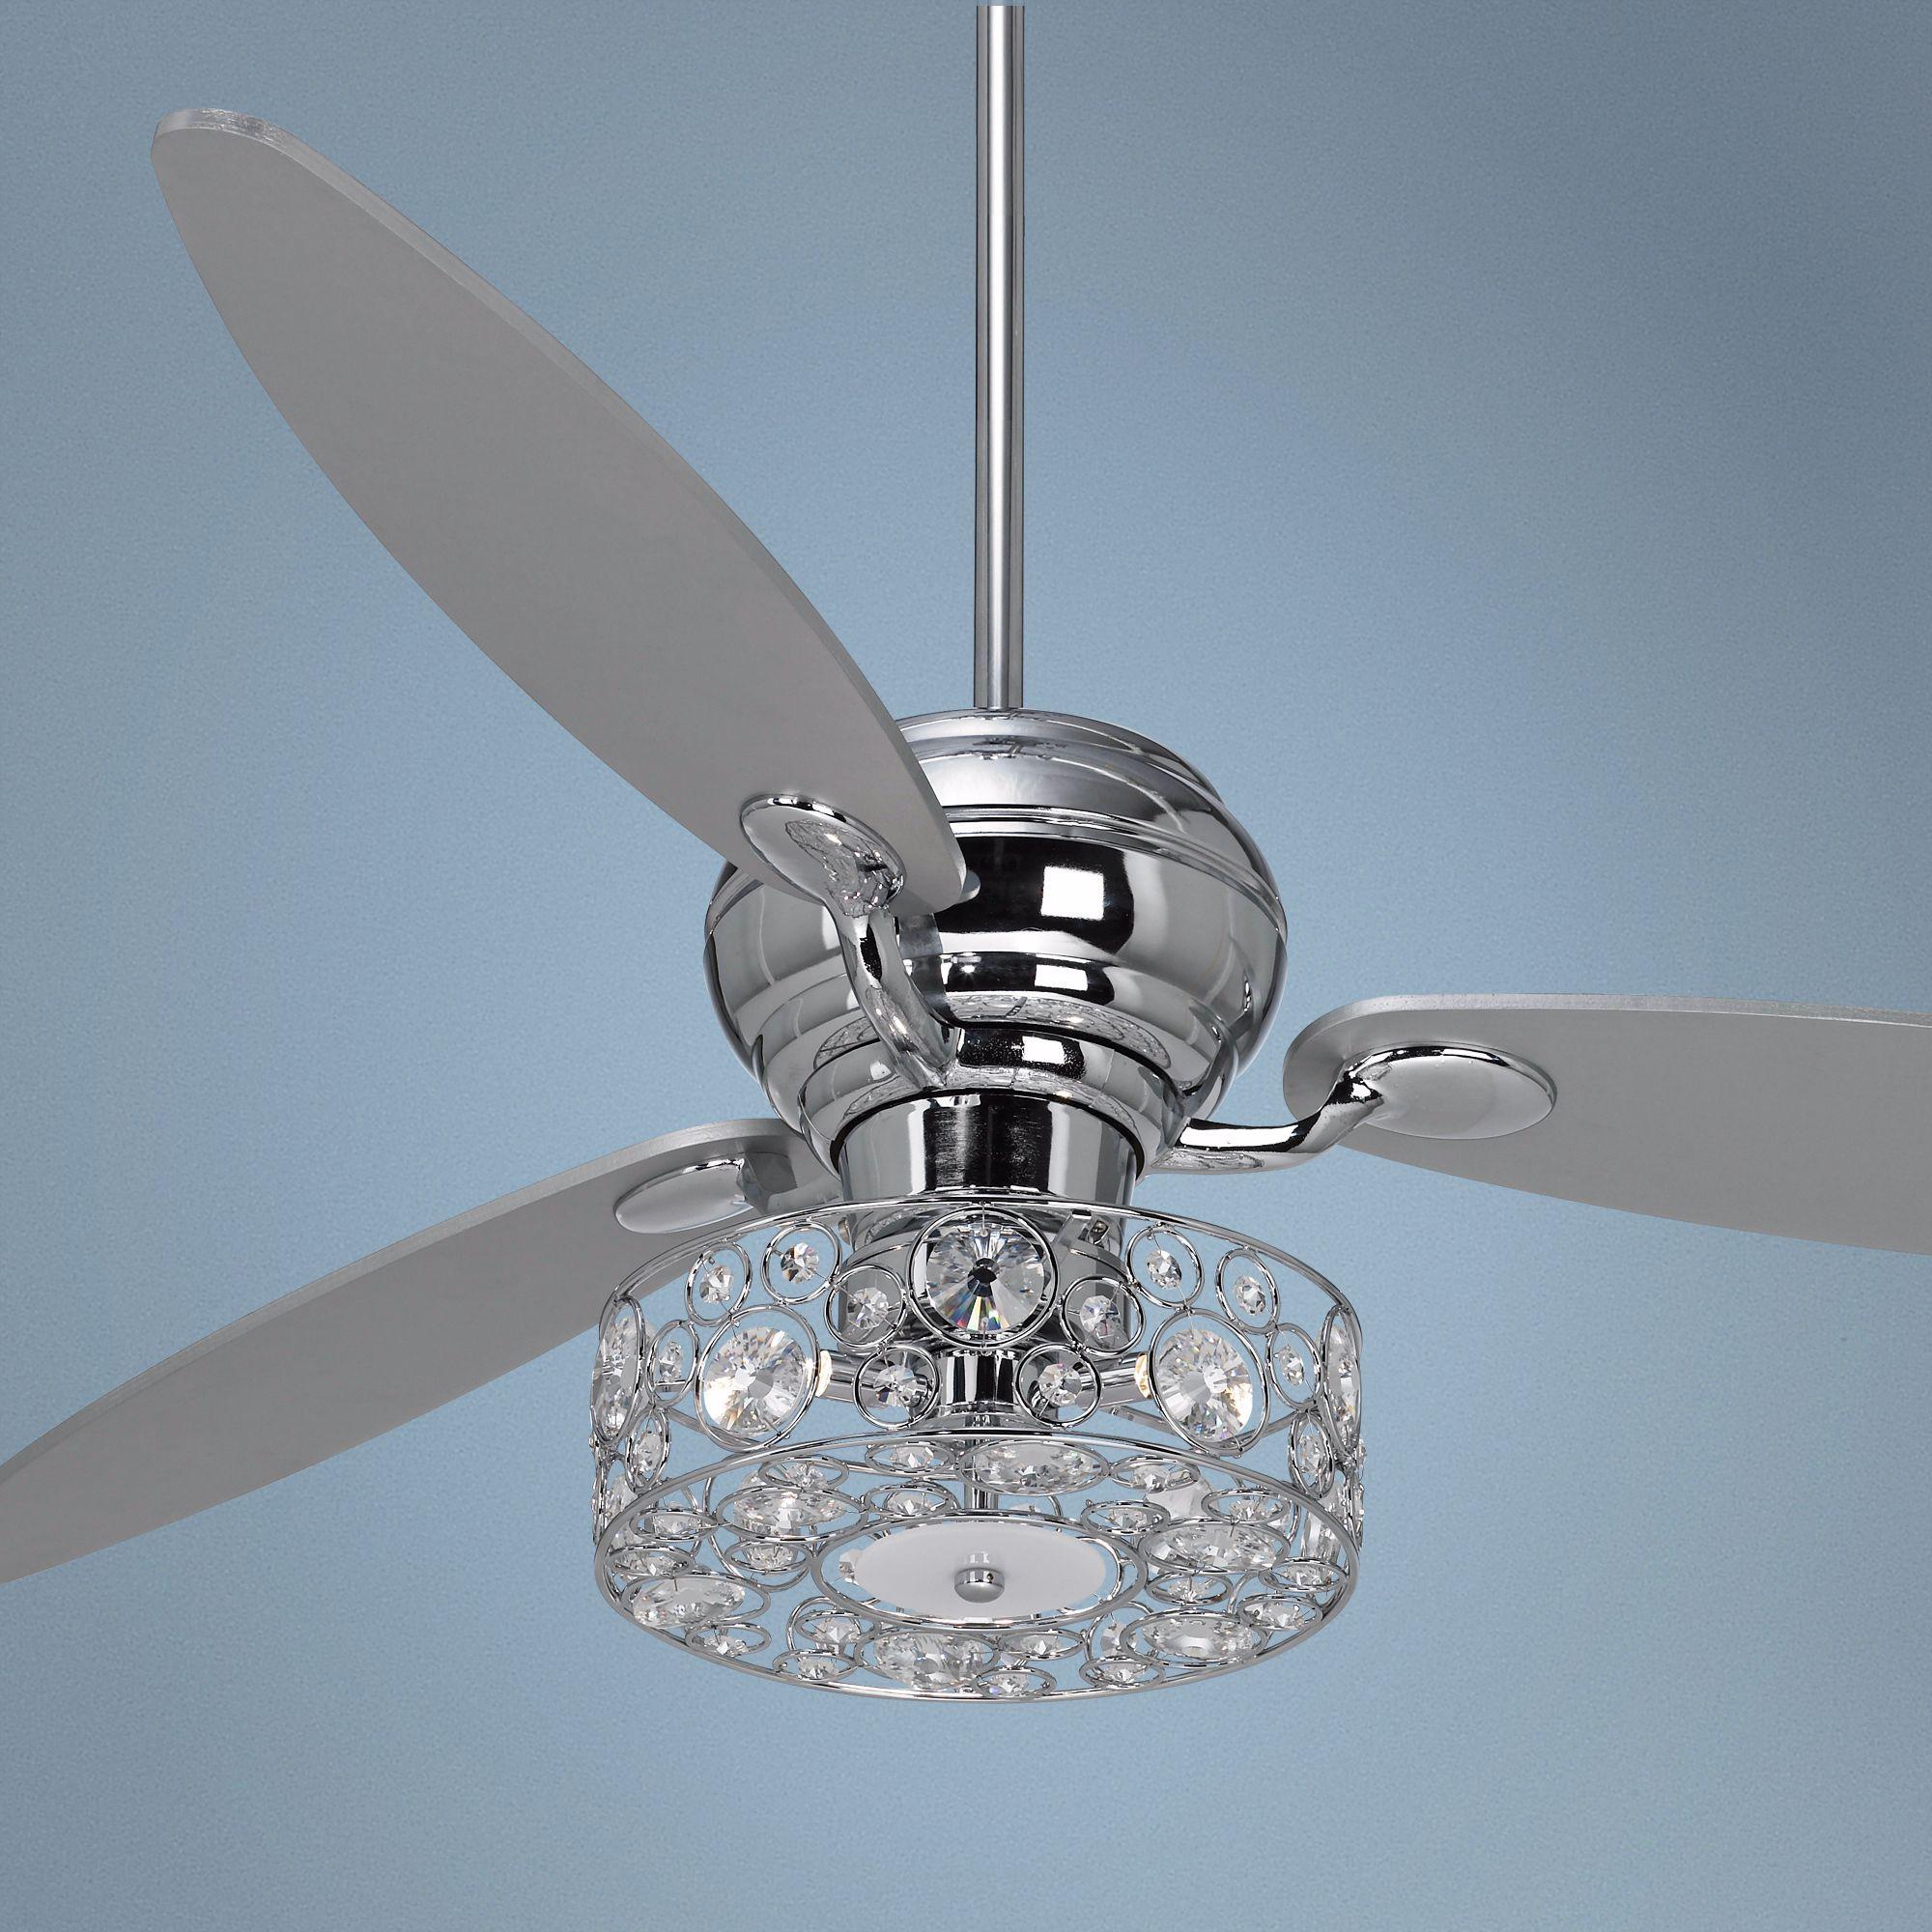 Casa Vieja Spyder Light Crystal Ceiling Fan 60 Chrome Eur2180